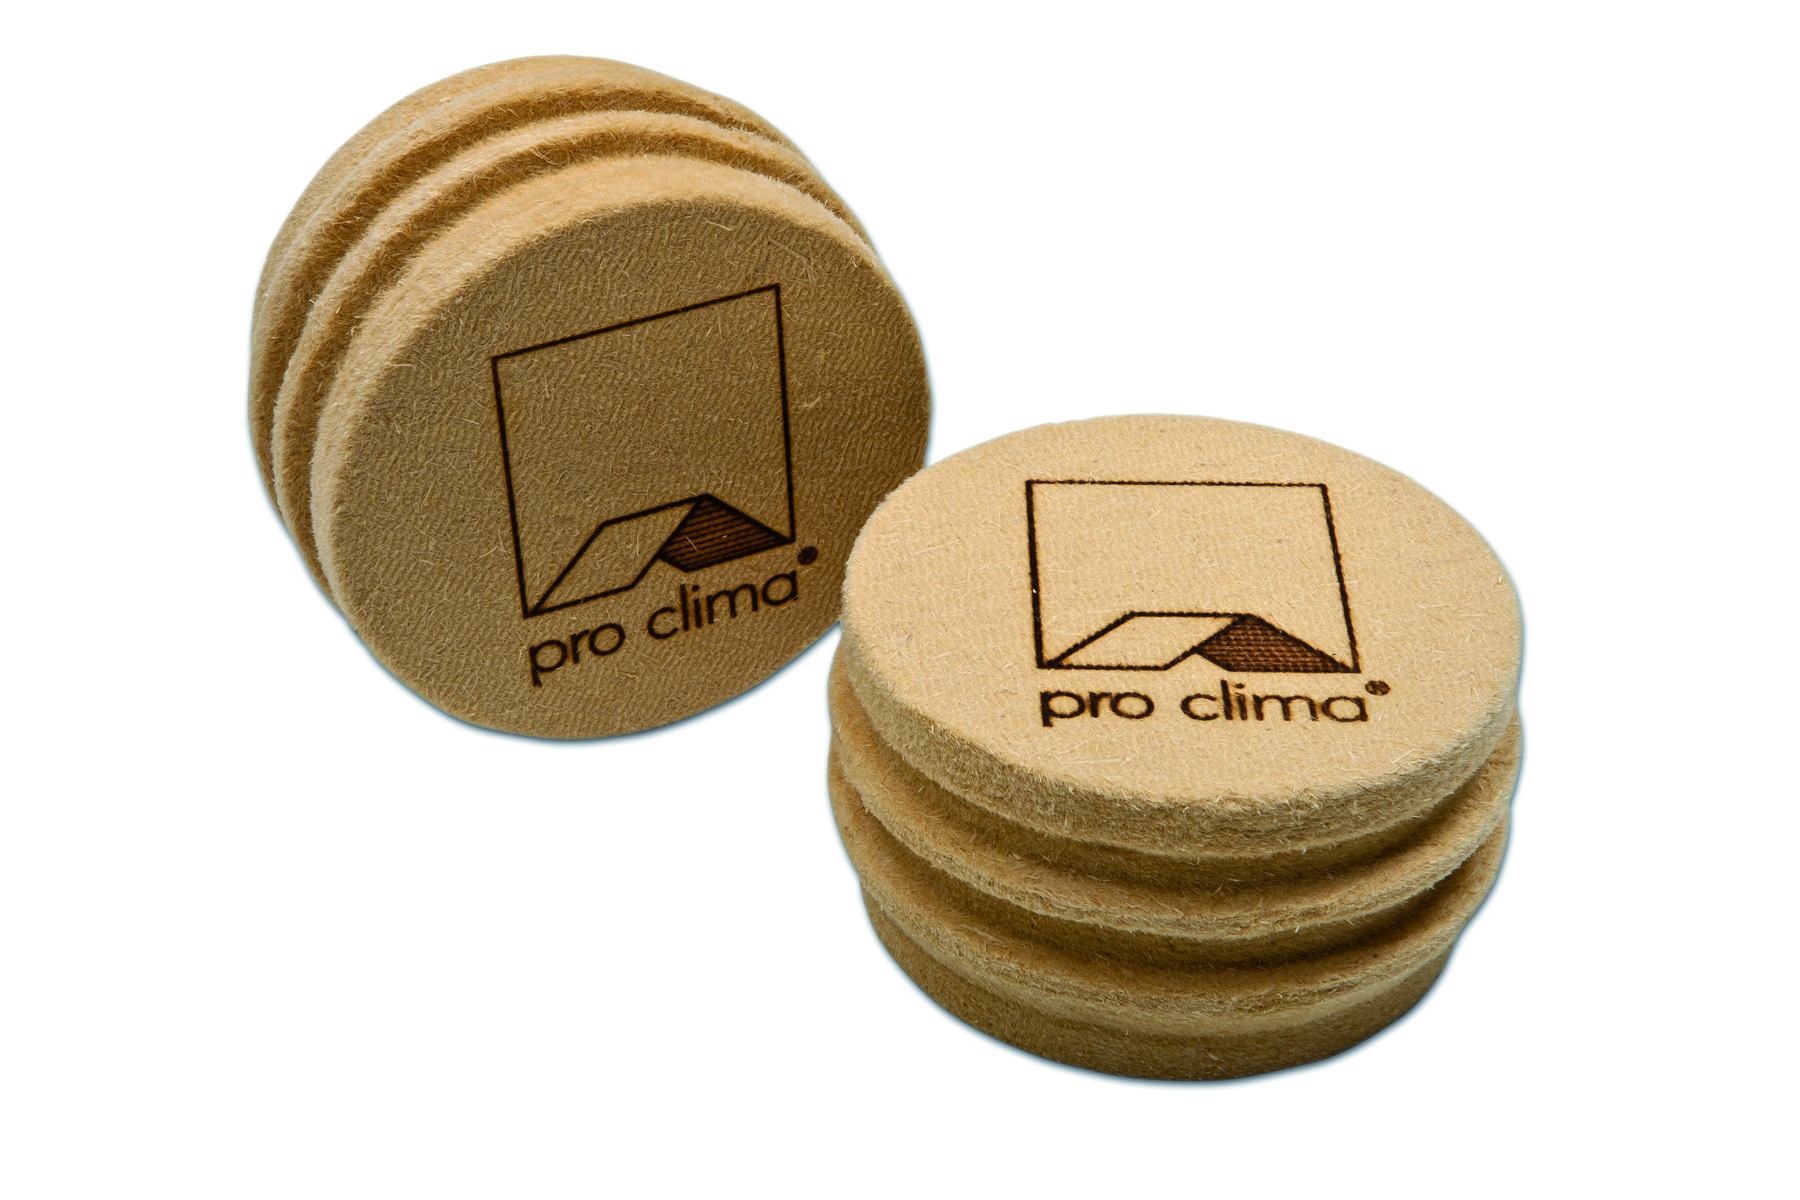 herbstneuheit 2012 pro clima clox erleichtert flockern. Black Bedroom Furniture Sets. Home Design Ideas